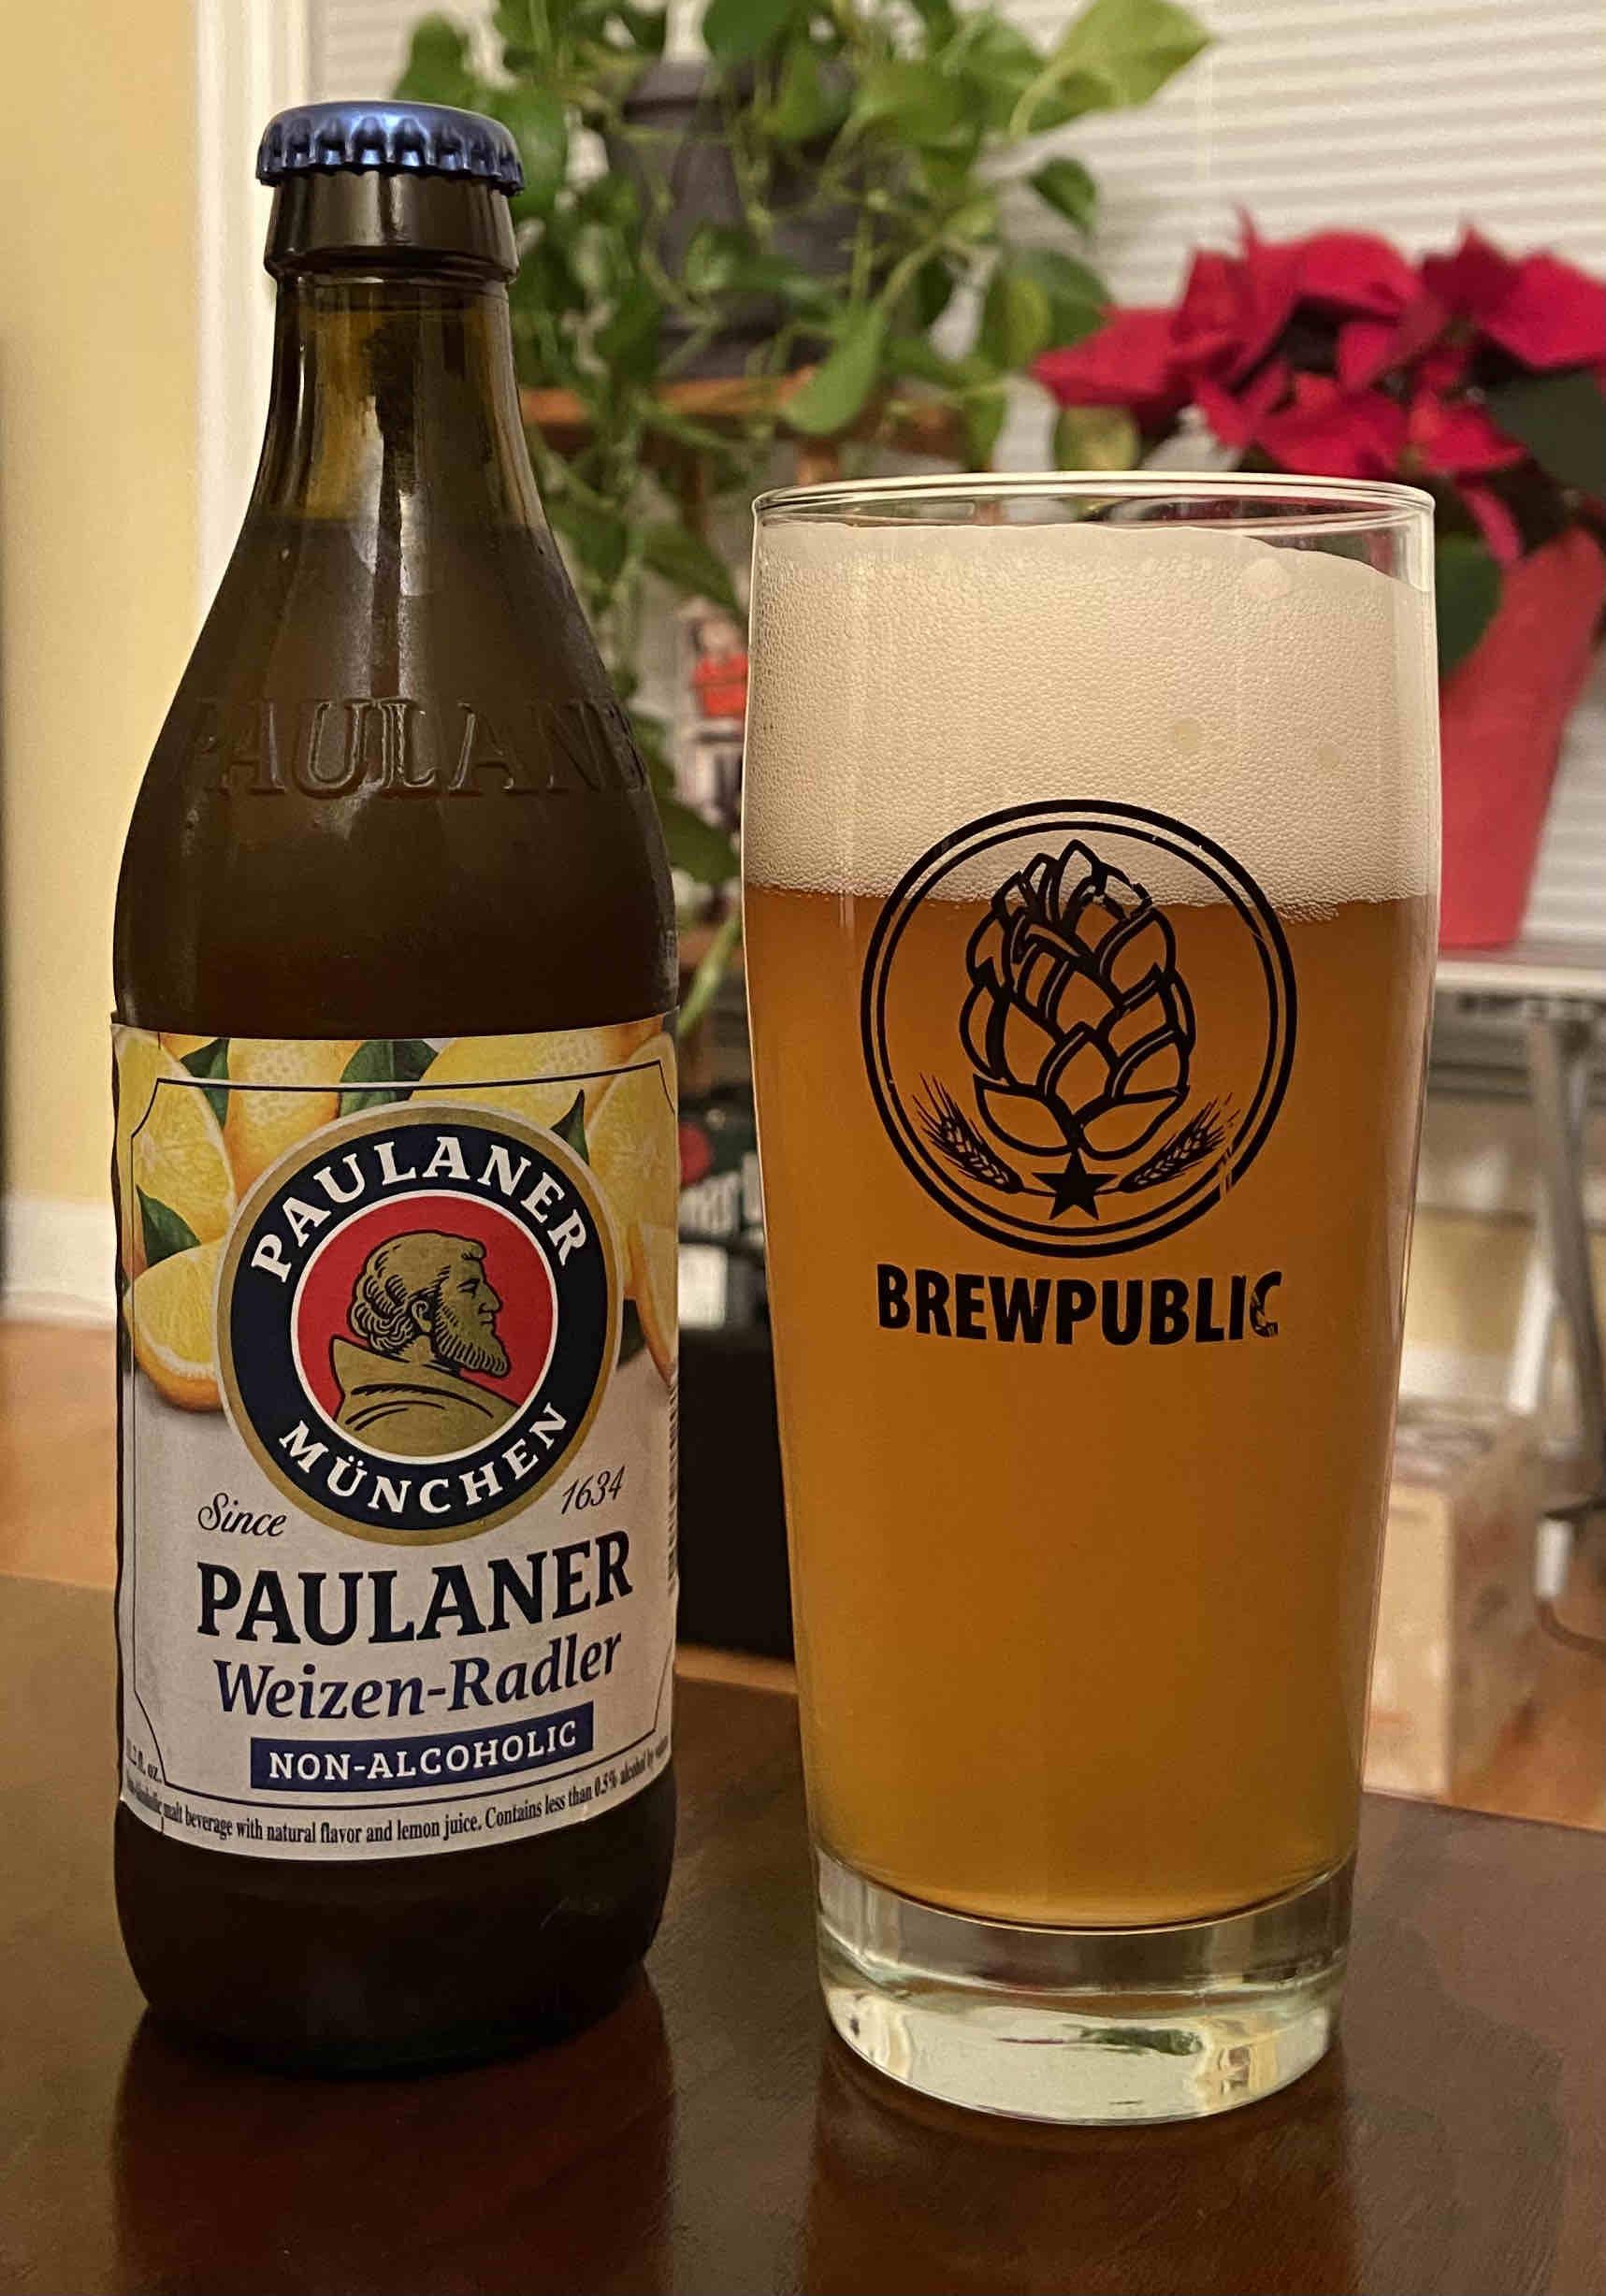 A glass pour of Paulaner Non-Alcoholic Weizen-Radler